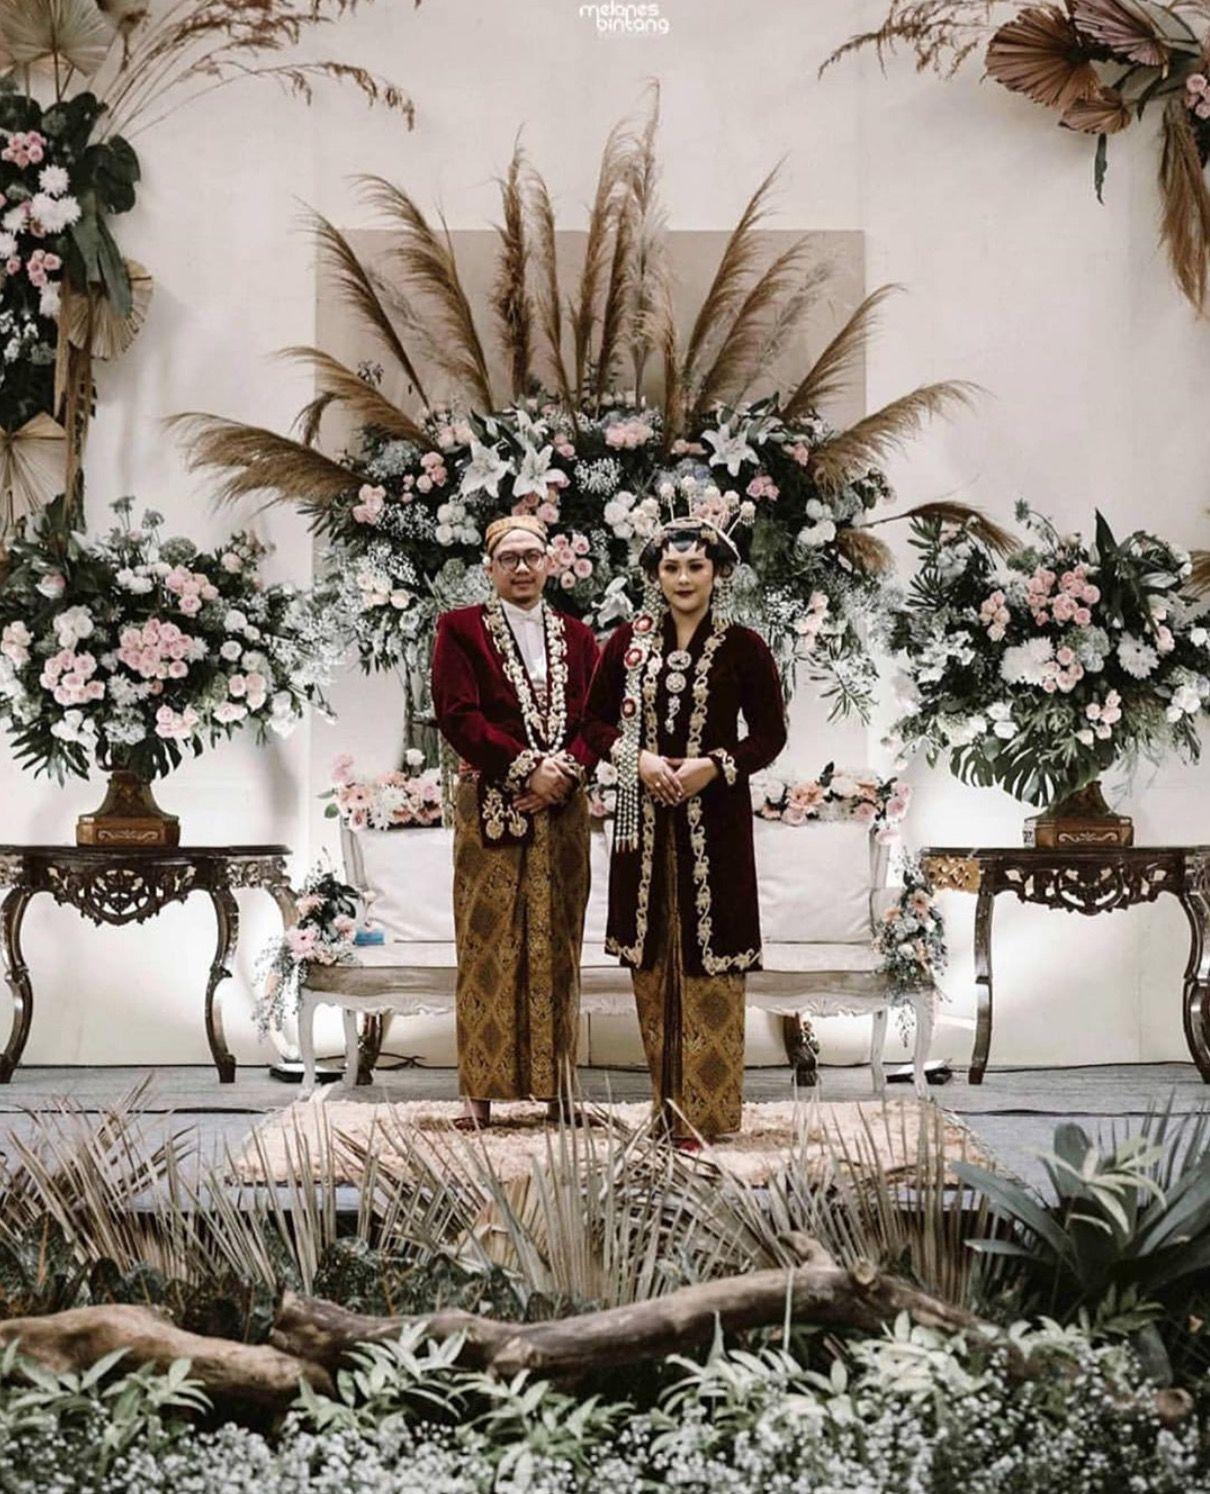 Dekorasi Pernikahan Dirumah Laki Laki